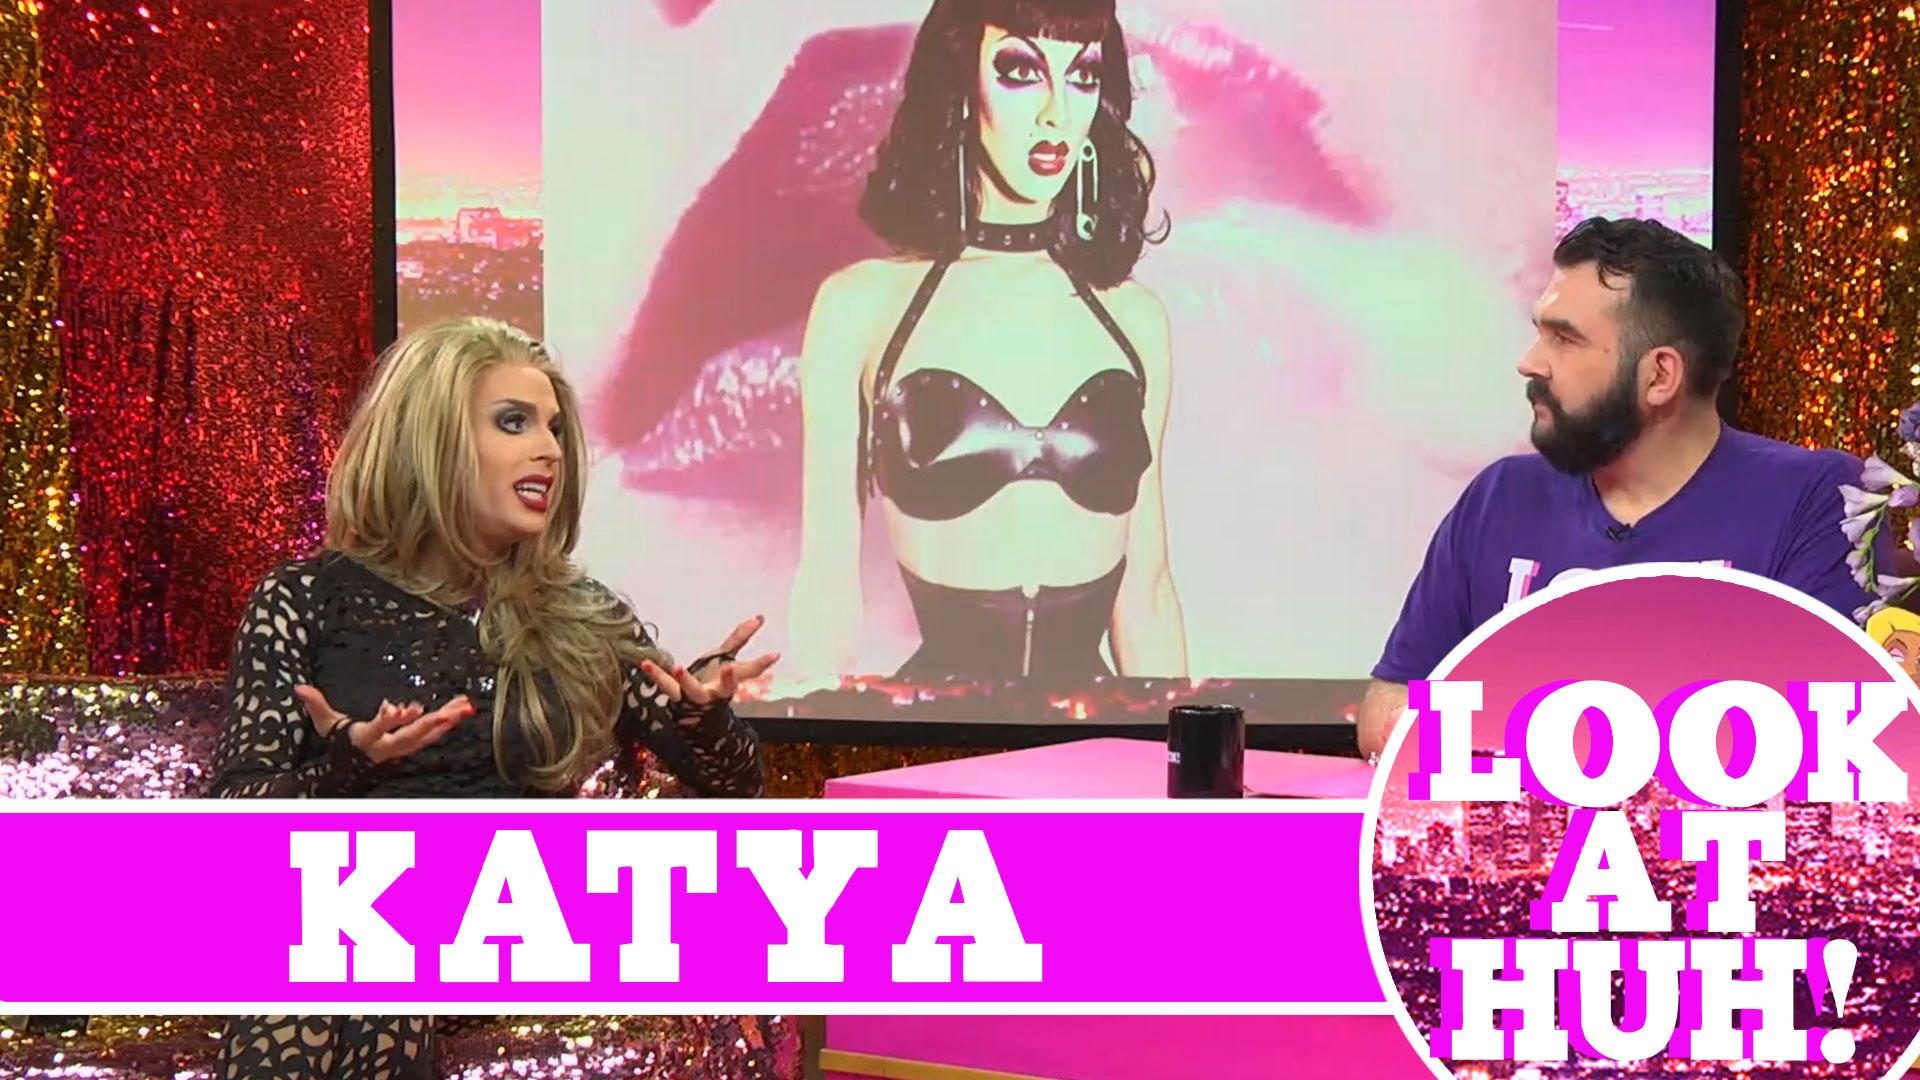 Katya on Hey Qween: Look at Huh SUPERSIZED Pt 1